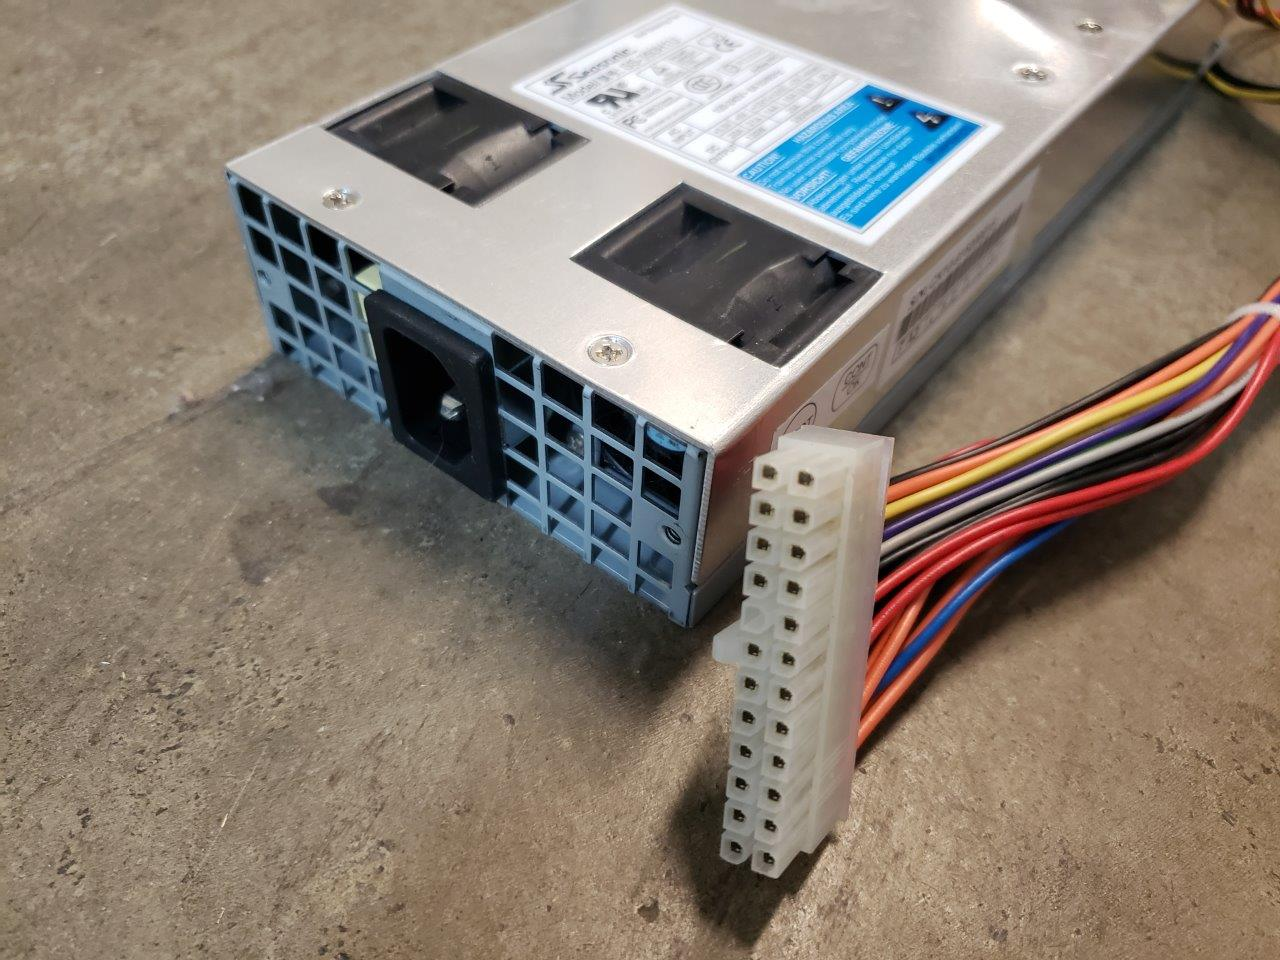 Seasonic Ss-350h1u 350w Industrial Active PFC Power Supply 1U Server PSU